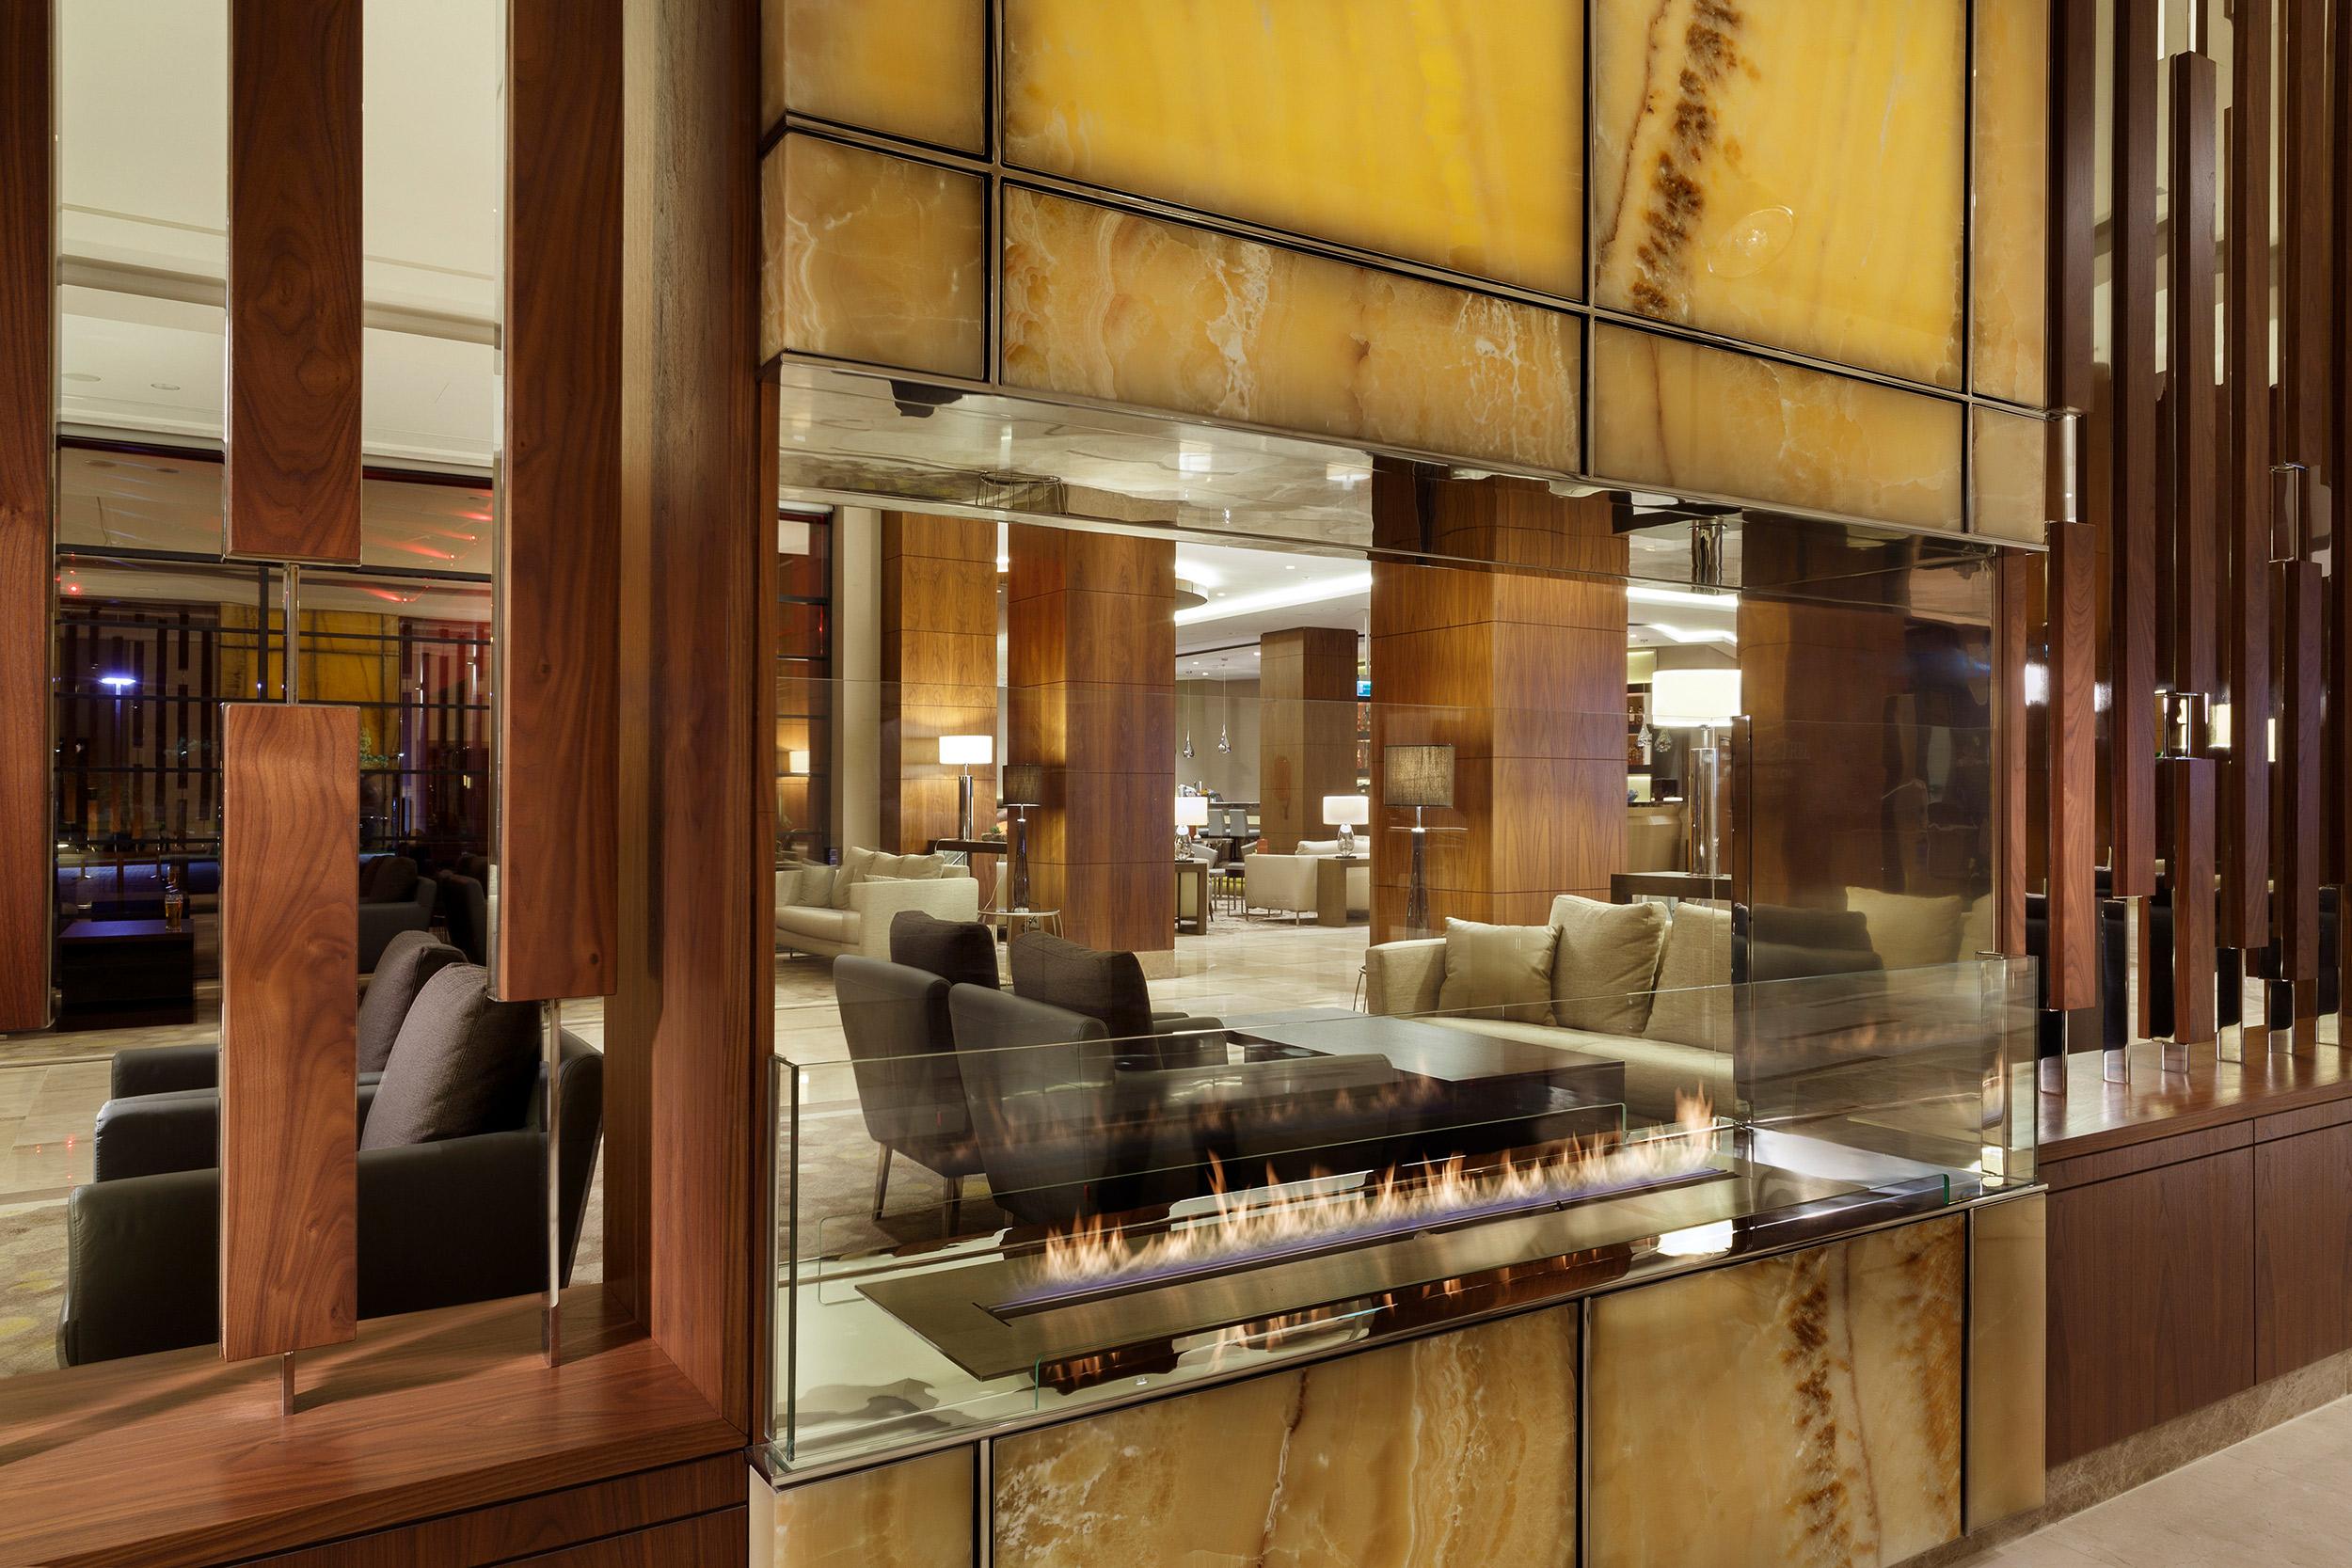 Fire-Line-Automatic-Planika-Hotel-Double-Tree-Hilton-Warsaw.jpg